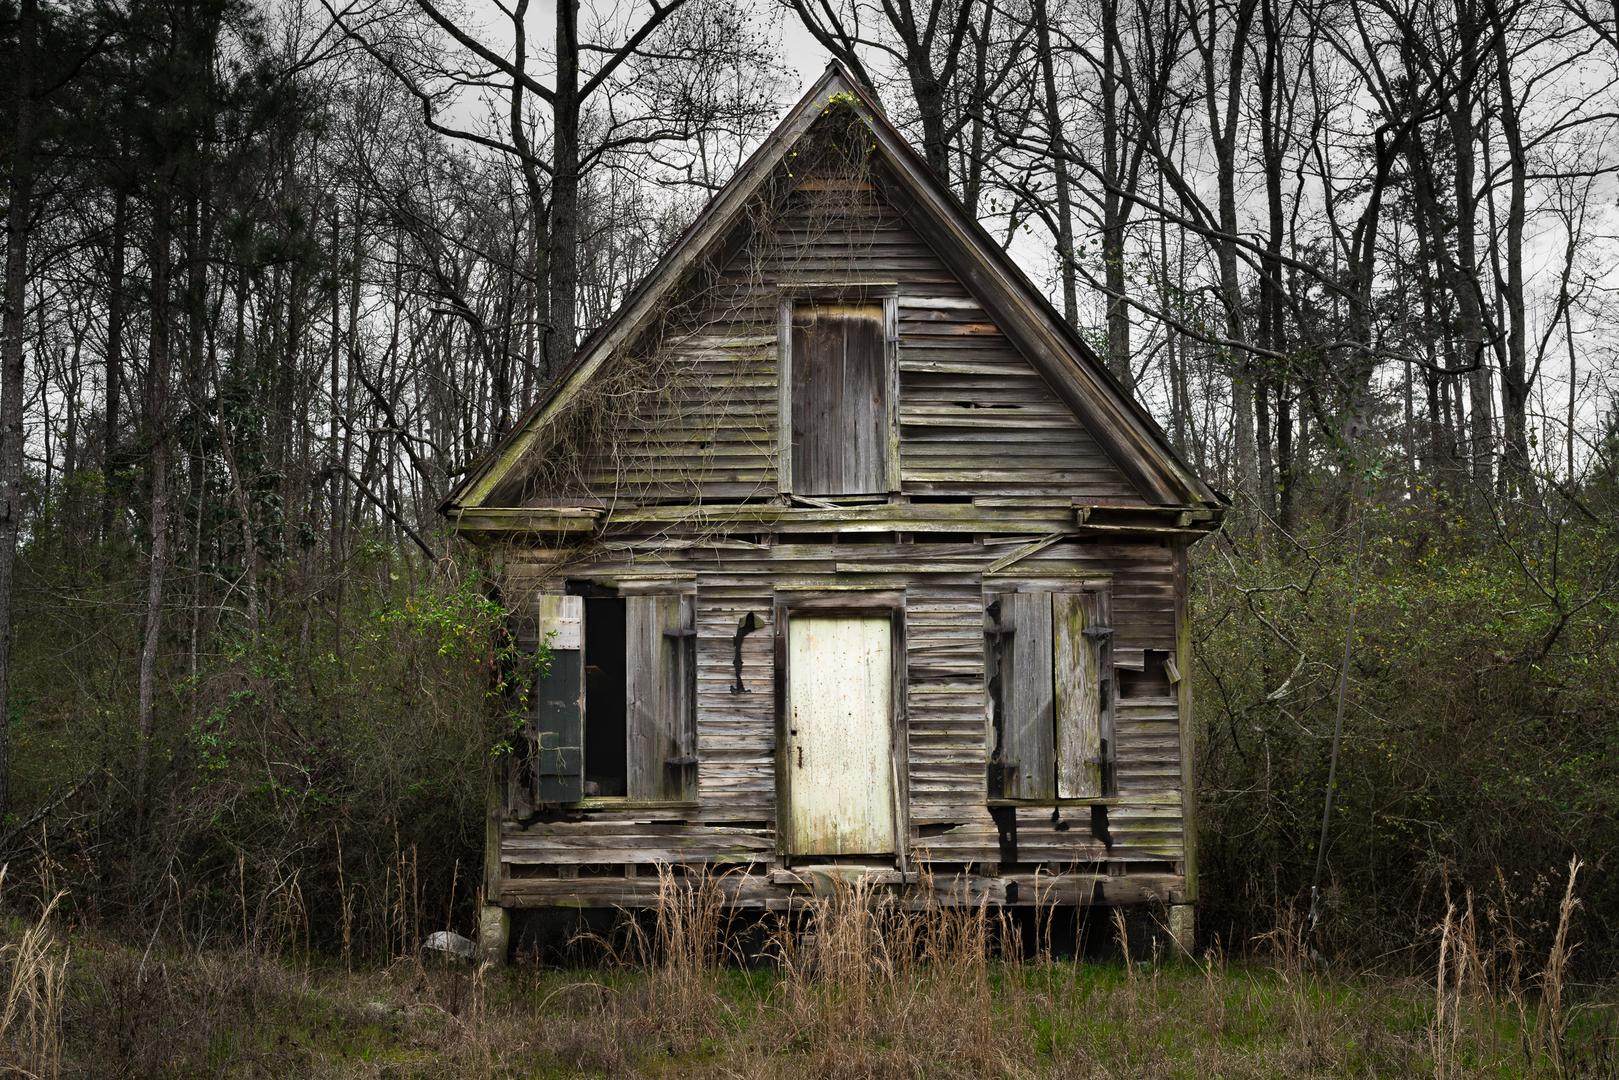 Green Moss House, Sparta, GA 2016